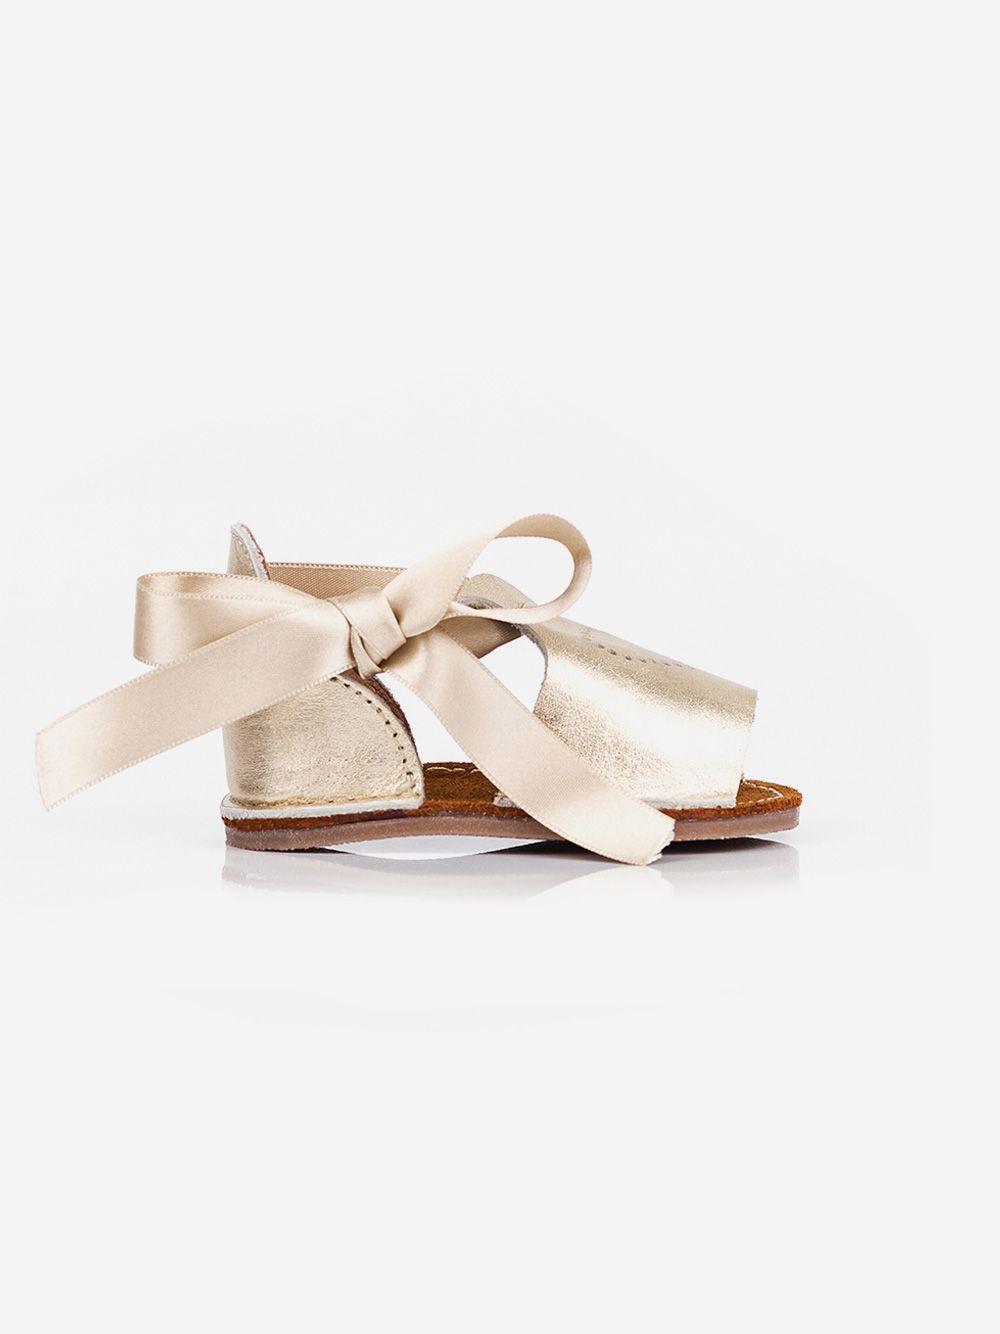 Sandálias Douradas para Bebé Baby Lisa | Pikitri